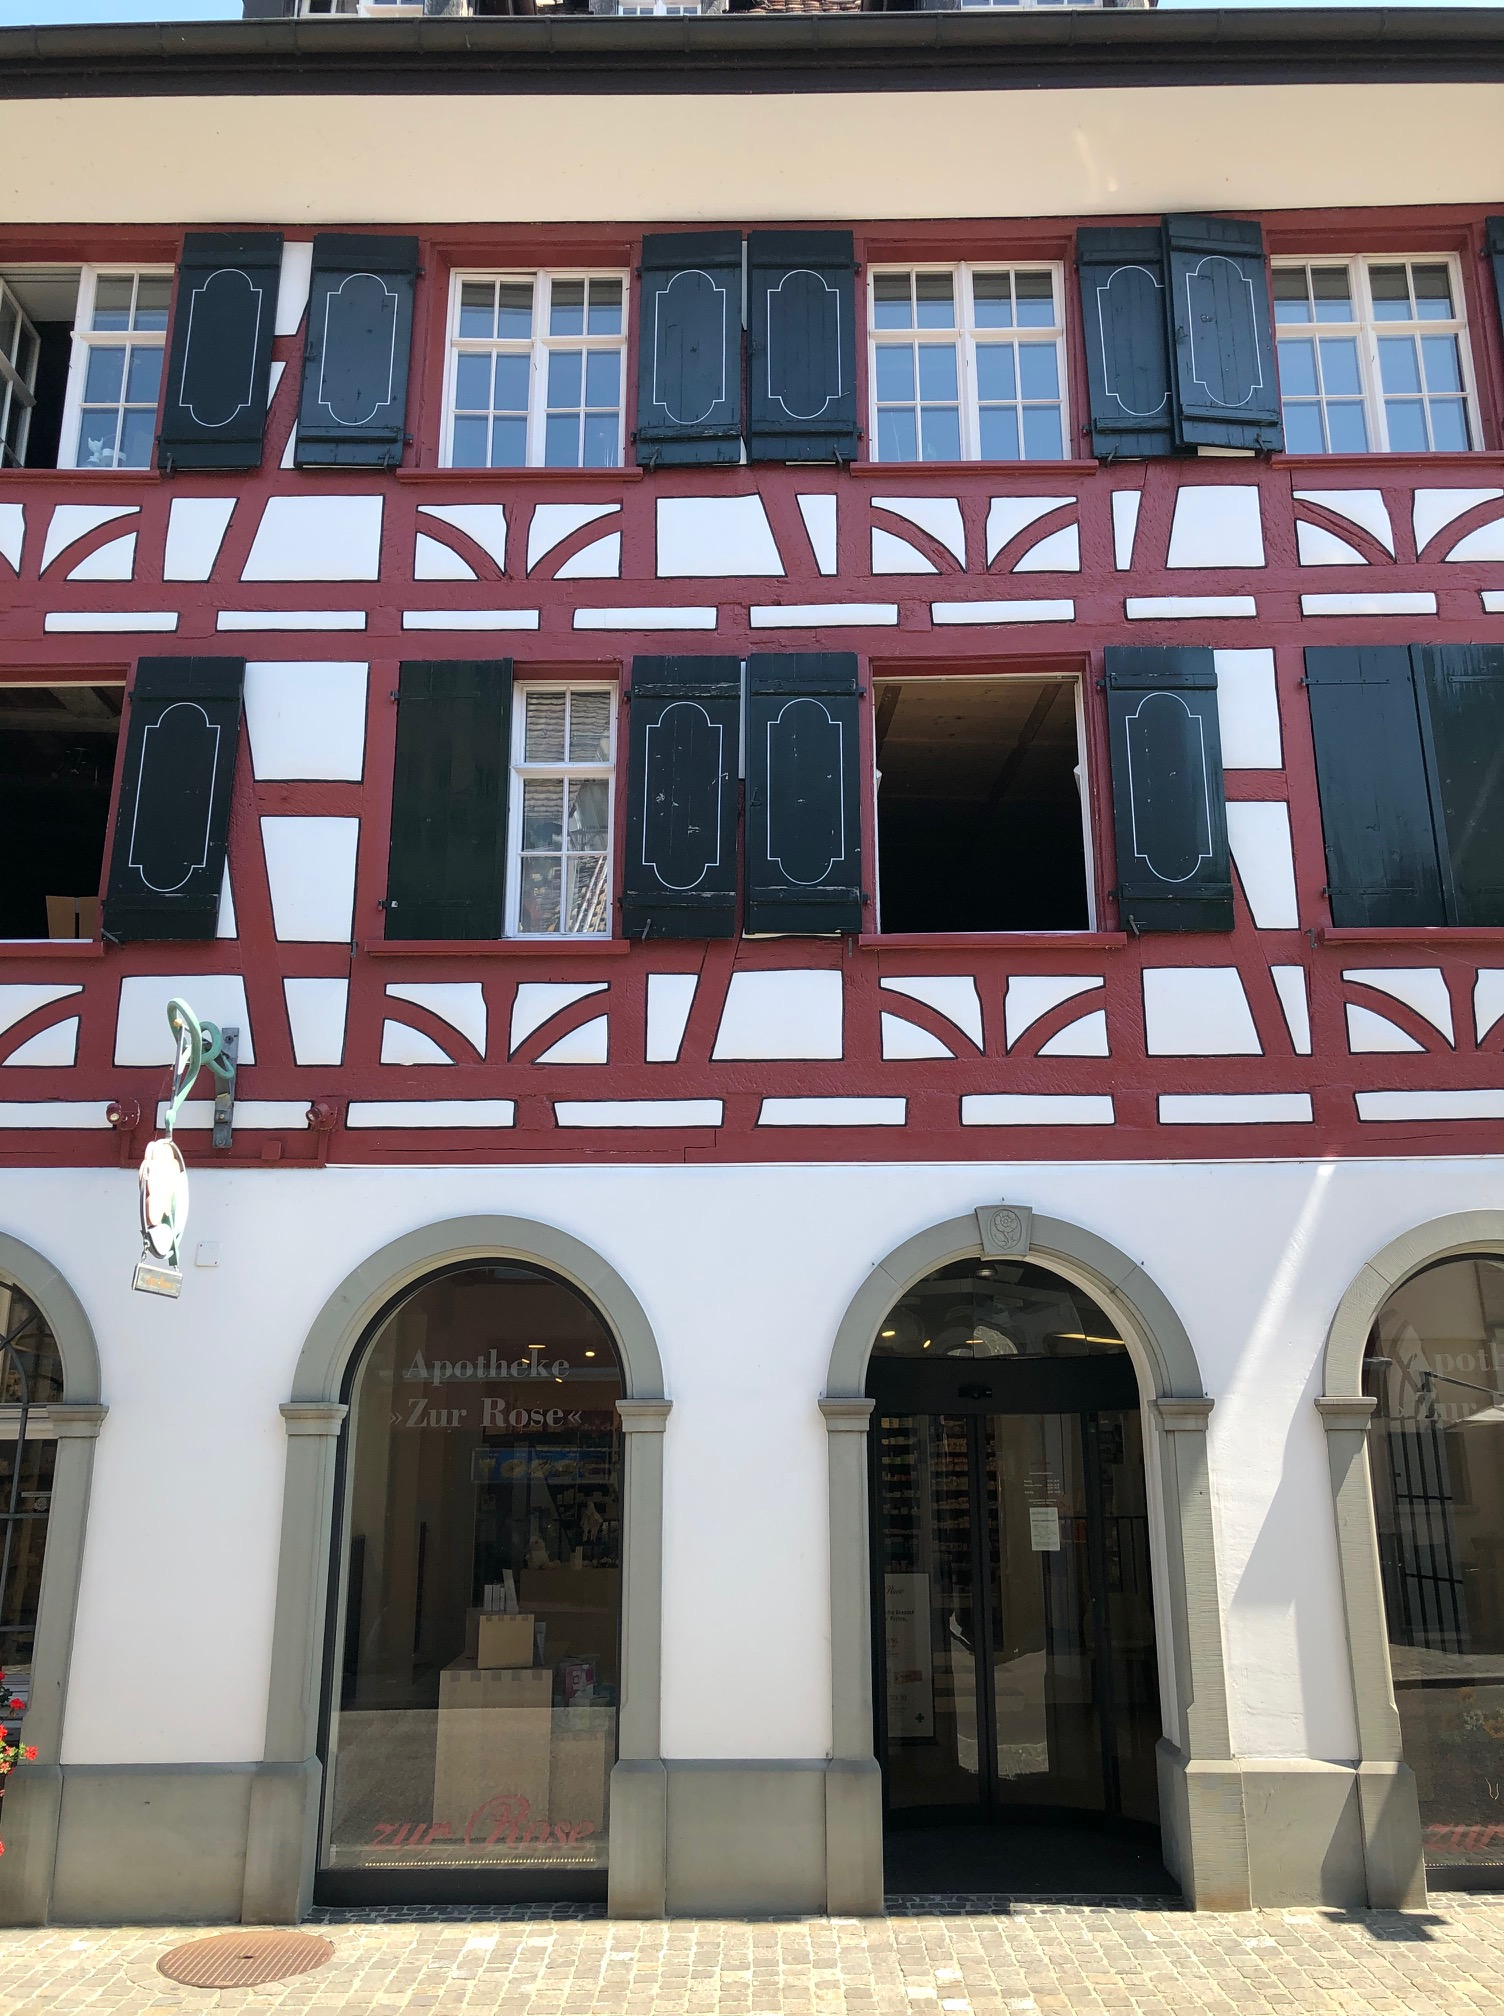 Aotheke Zur Rose in Steckborn am Bodensee / Foto: T. Lang